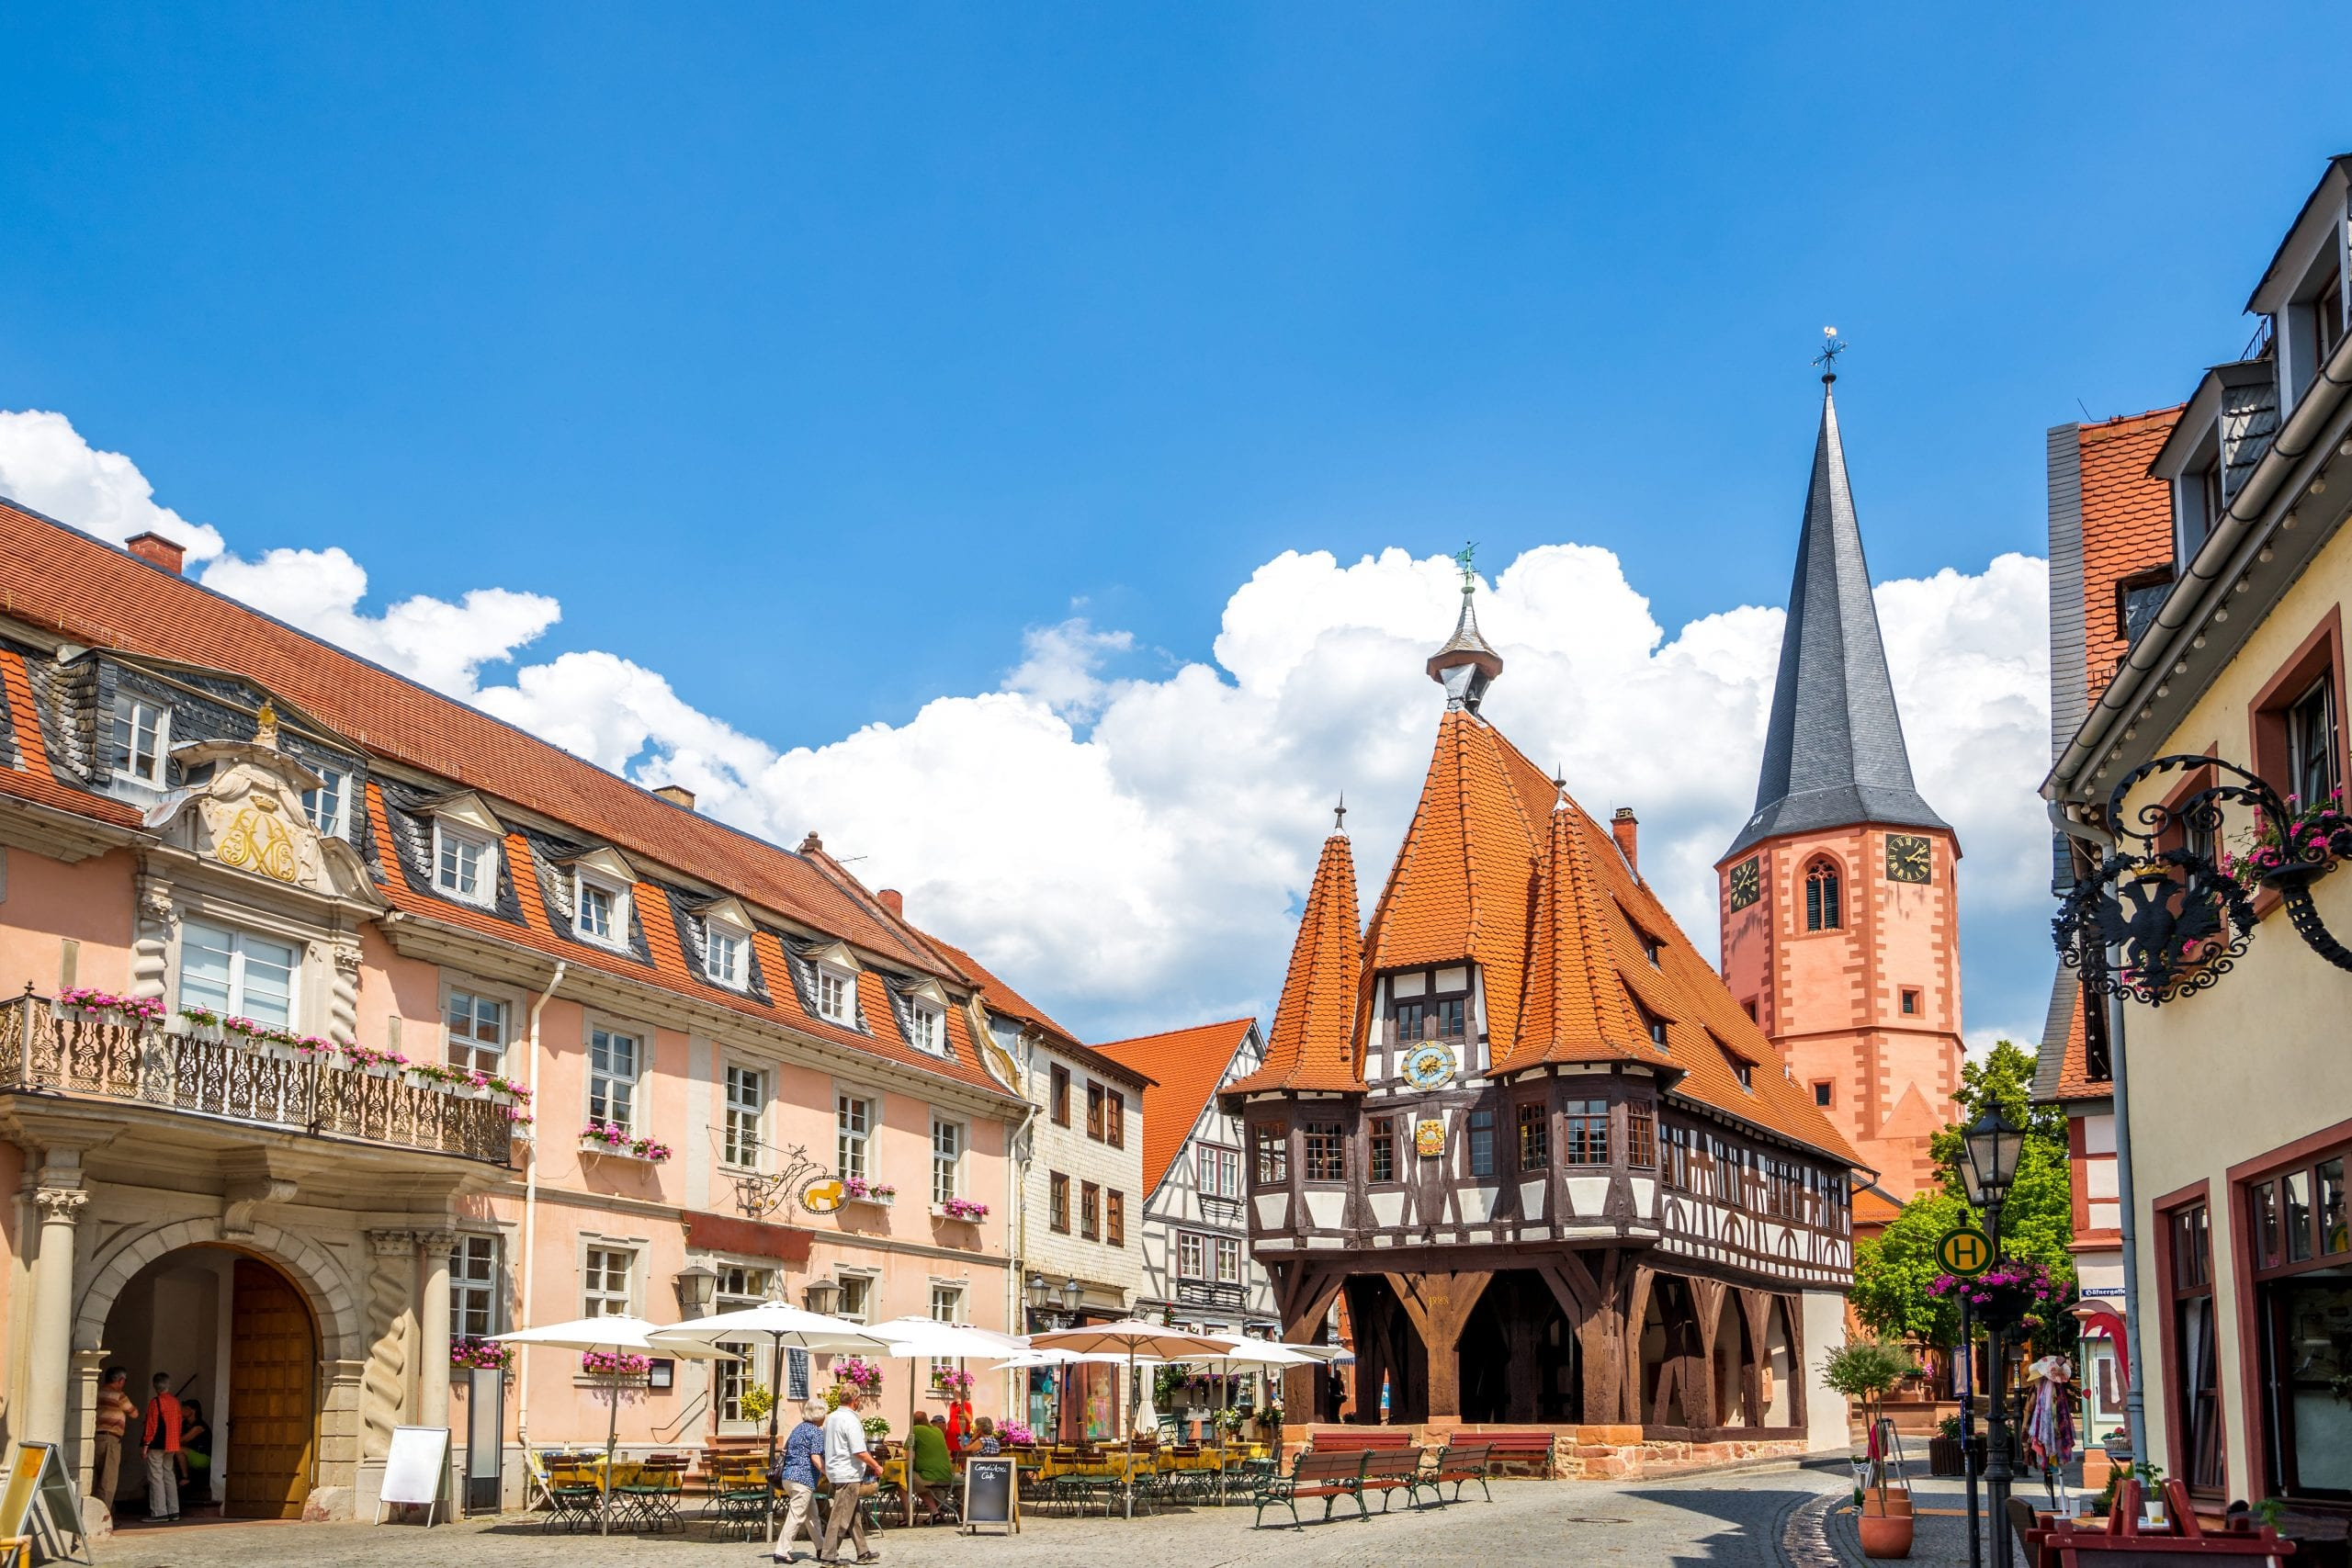 Michelstadt: a Hidden Gem in Germany's Odenwald